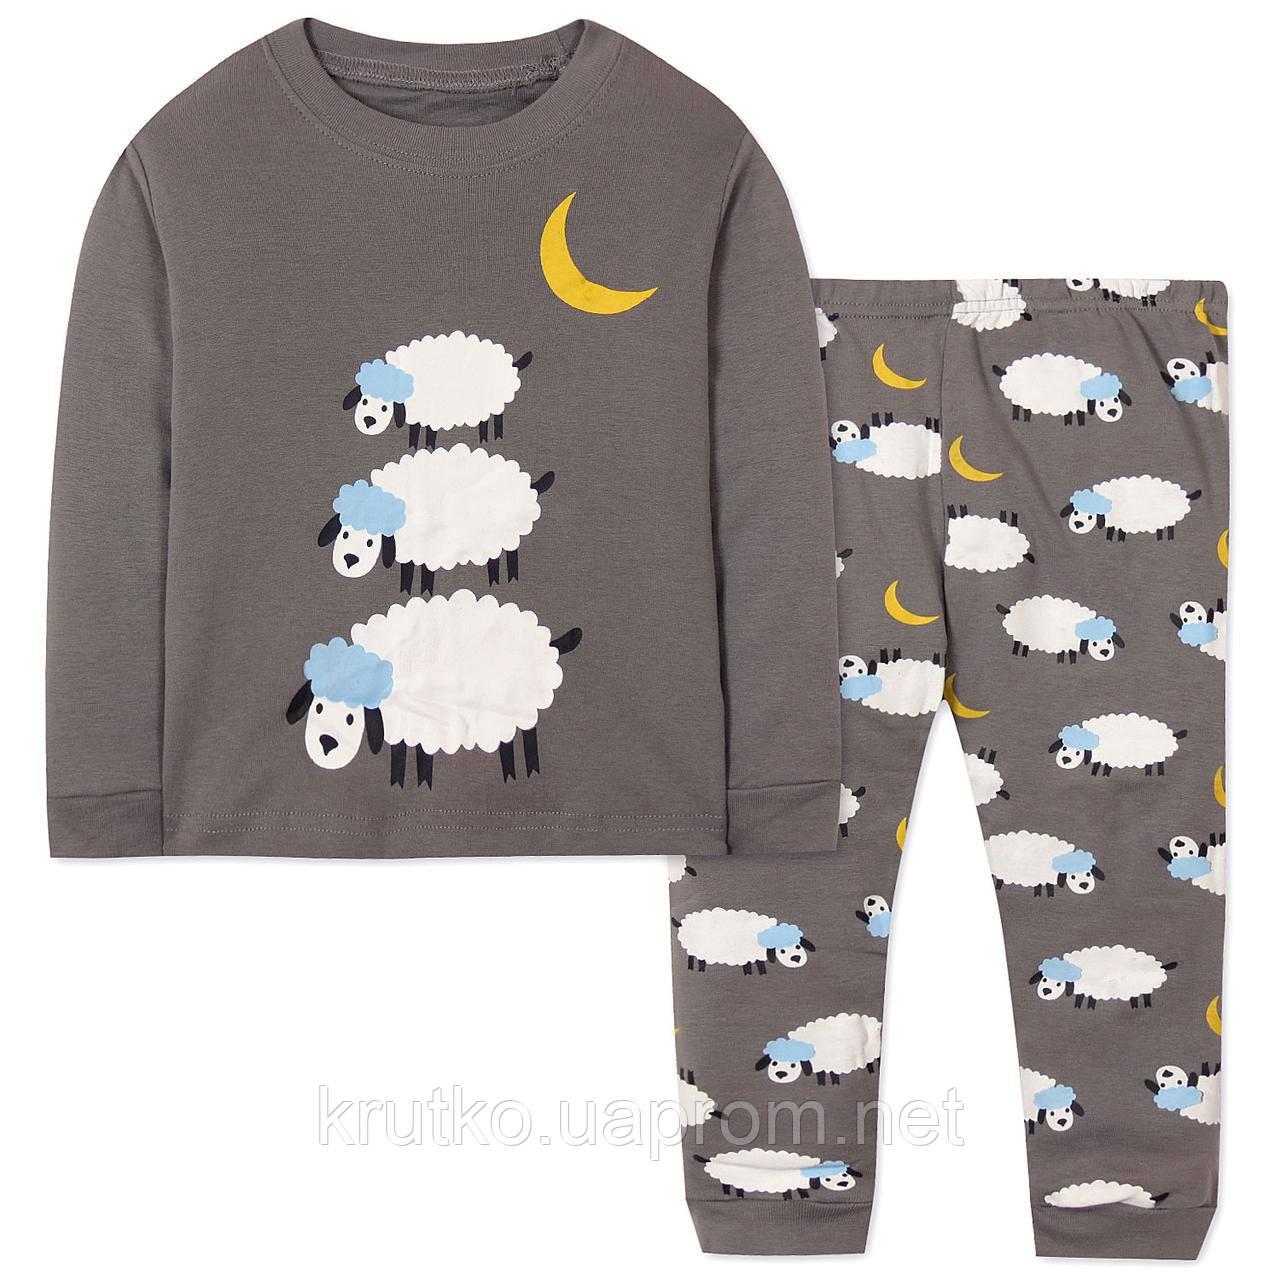 Пижама Овечки Wibbly pigbaby (95)